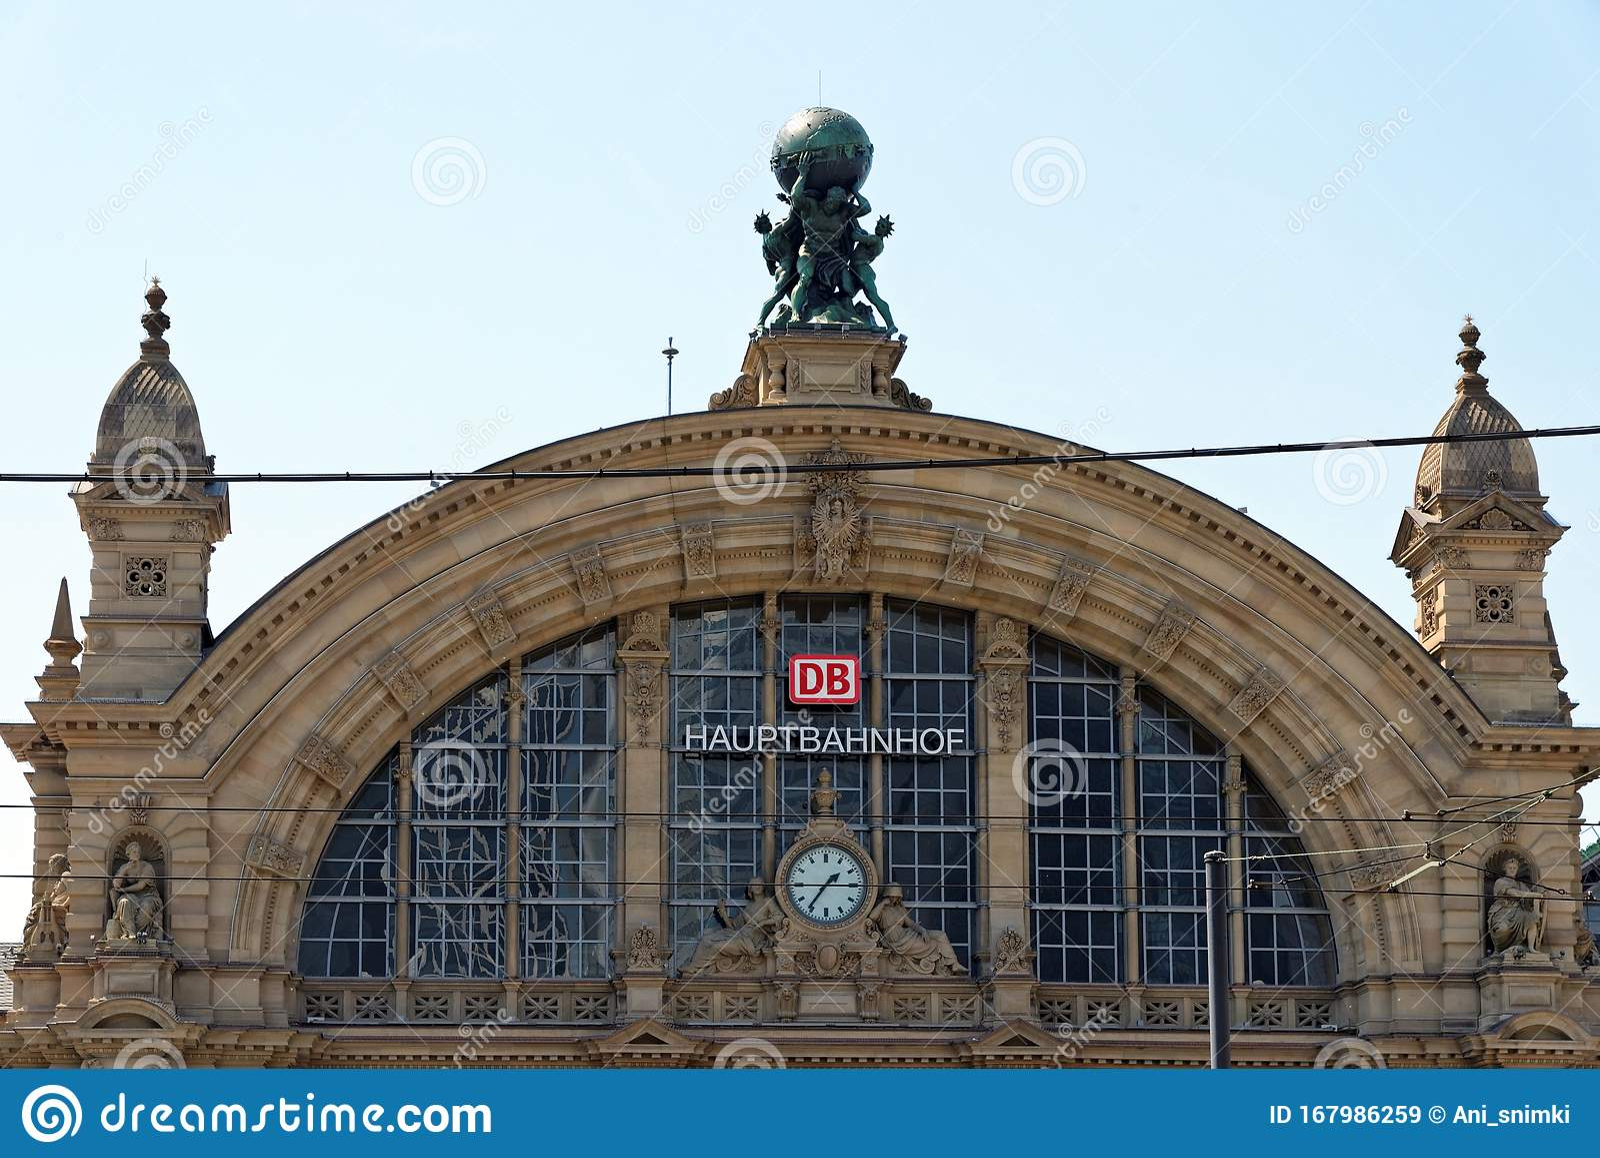 Deutsche Bahn Frankfurt Hauptbahnhof